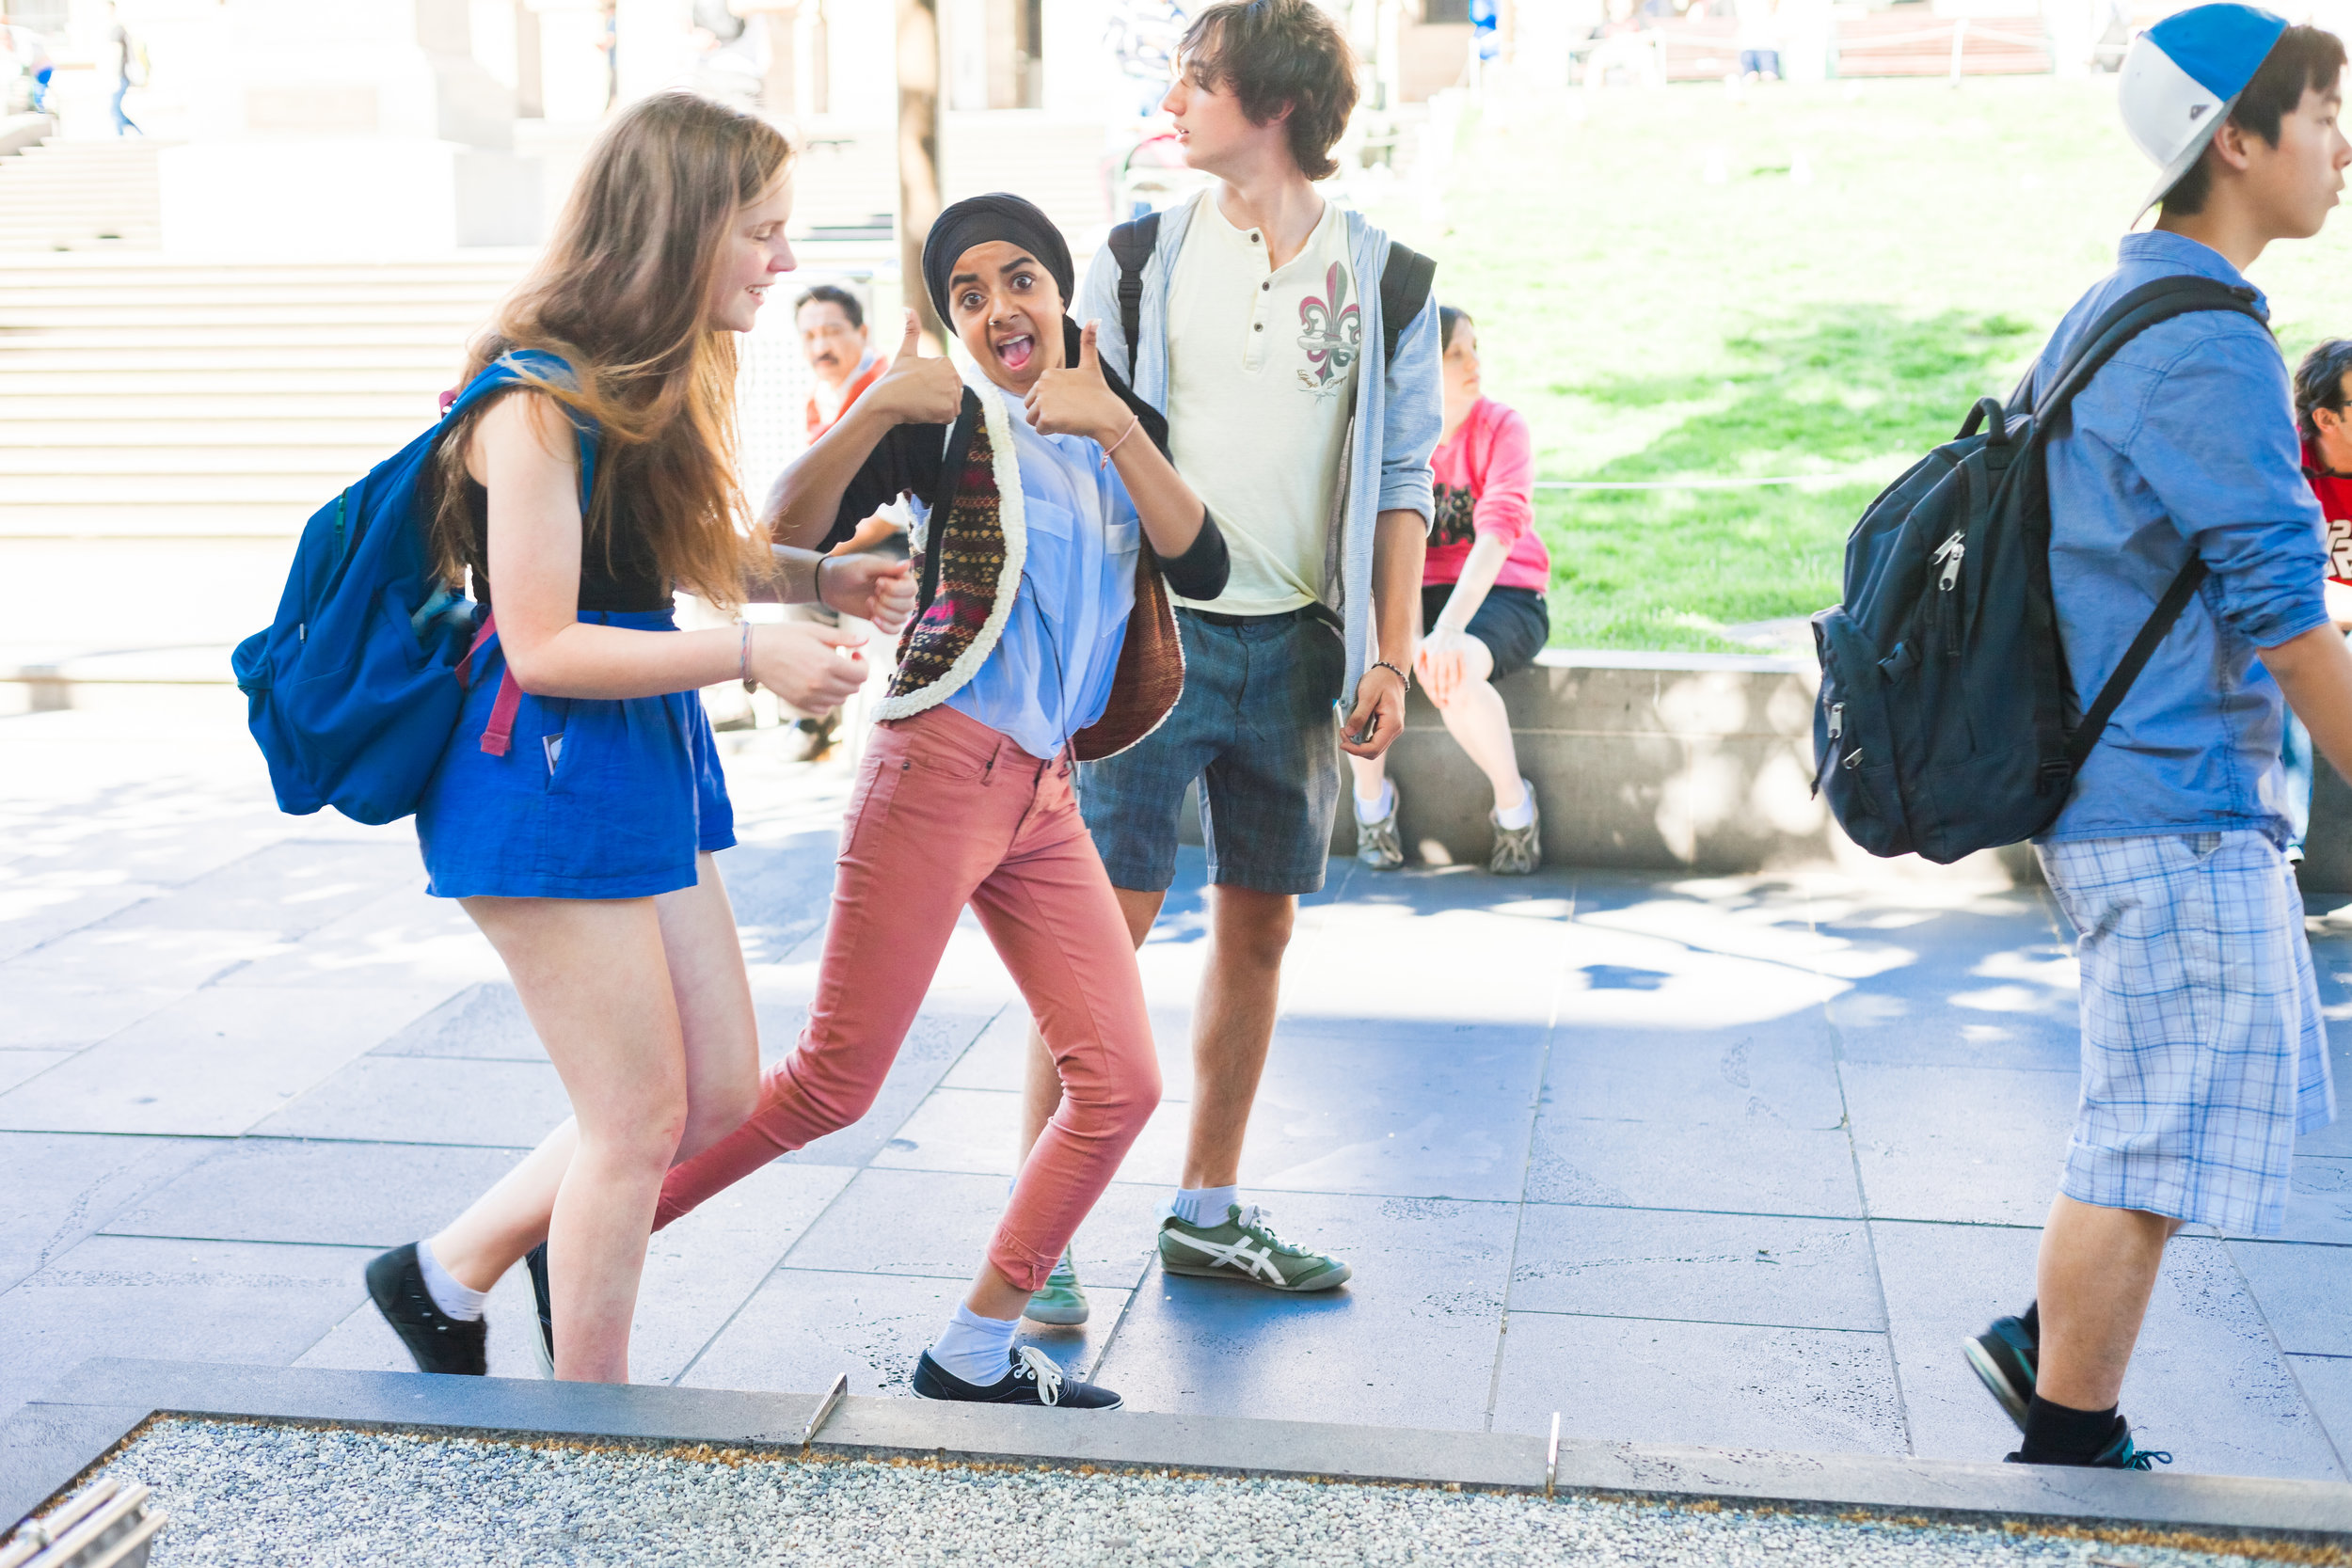 Teen friendship